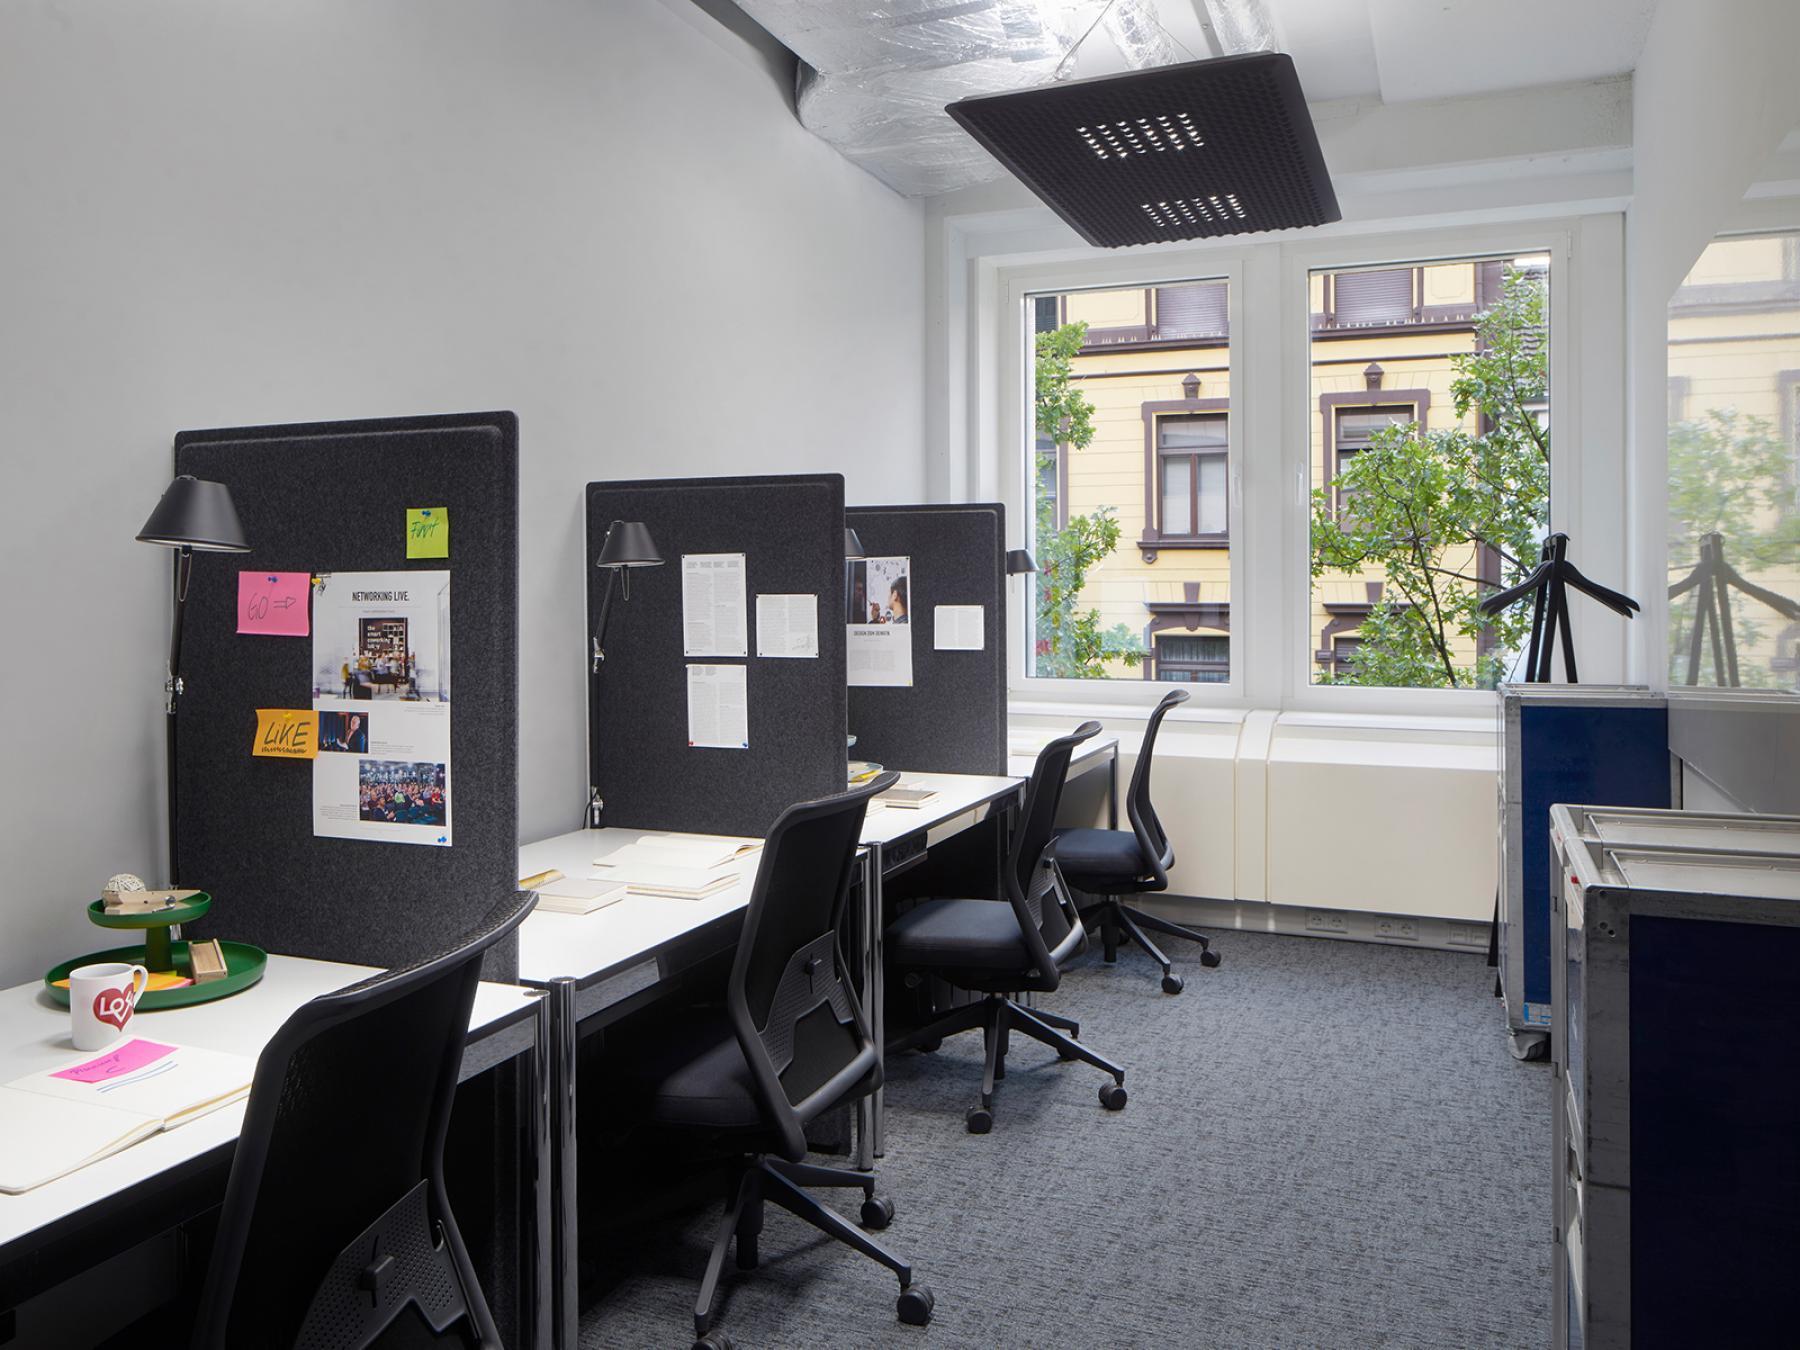 Feste Arbeitsplätze in offener Coworking-Area